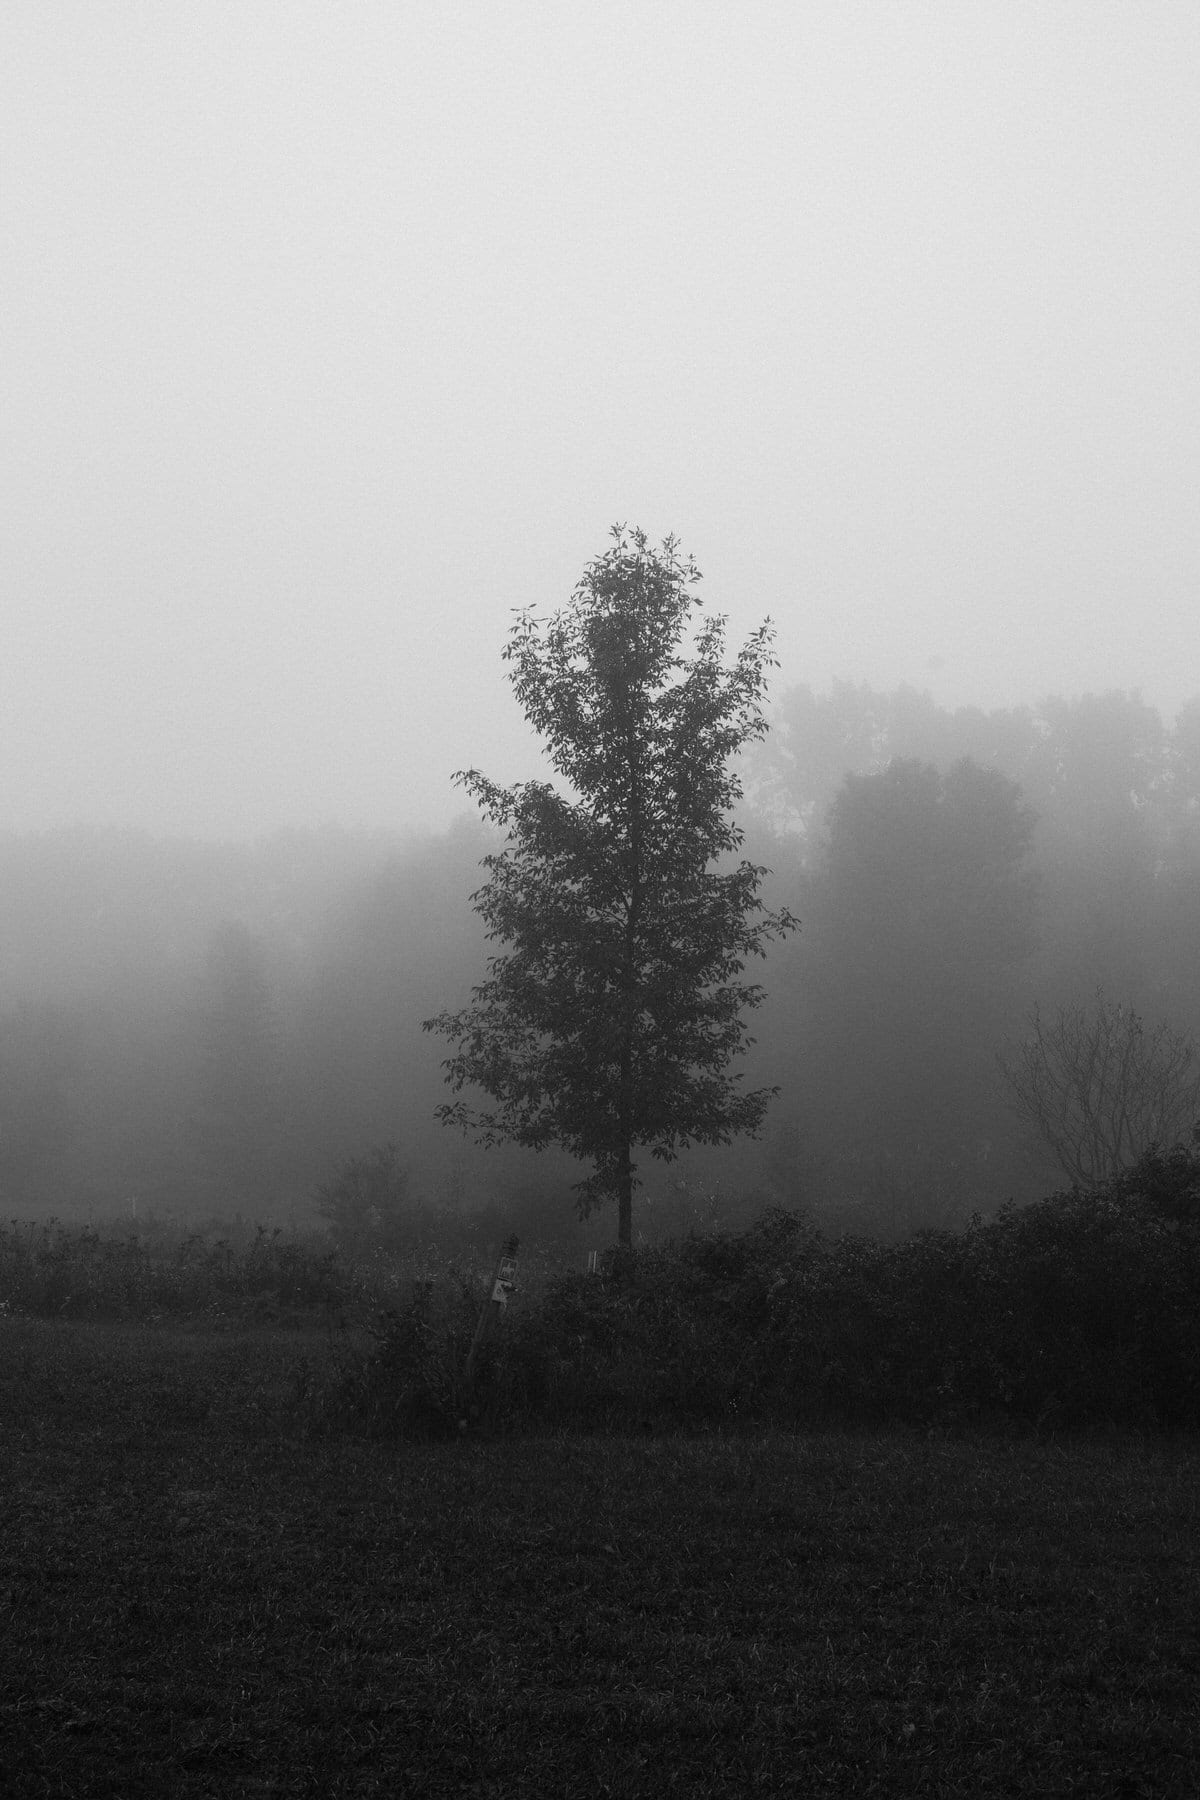 Kiekhaefer-Park-Fond-du-Lac-Wisconsin-black-and-white-fine-art-photography-by-Studio-L-photographer-Laura-Schneider-_3391